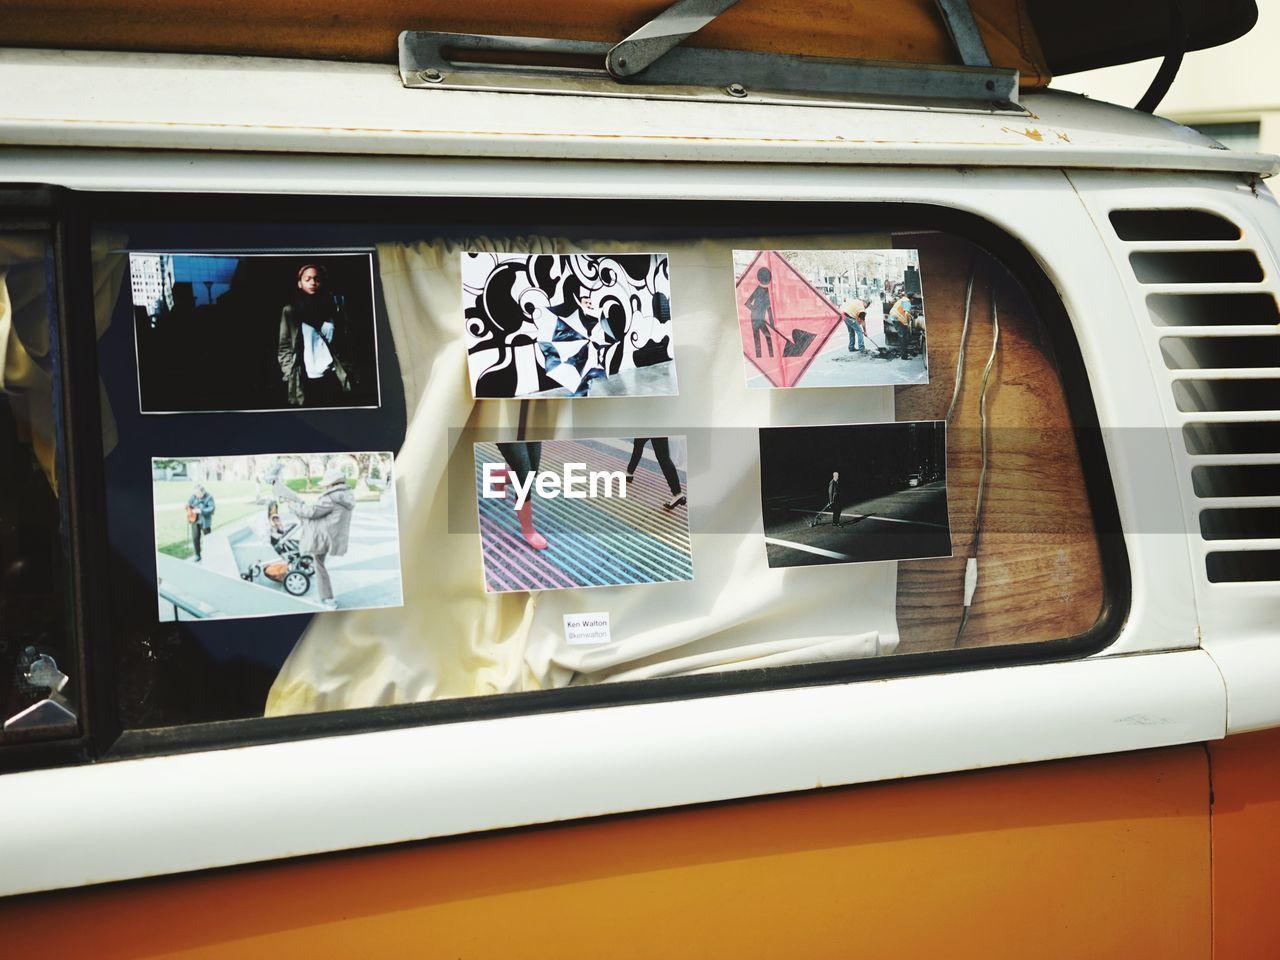 Posters on vehicle window